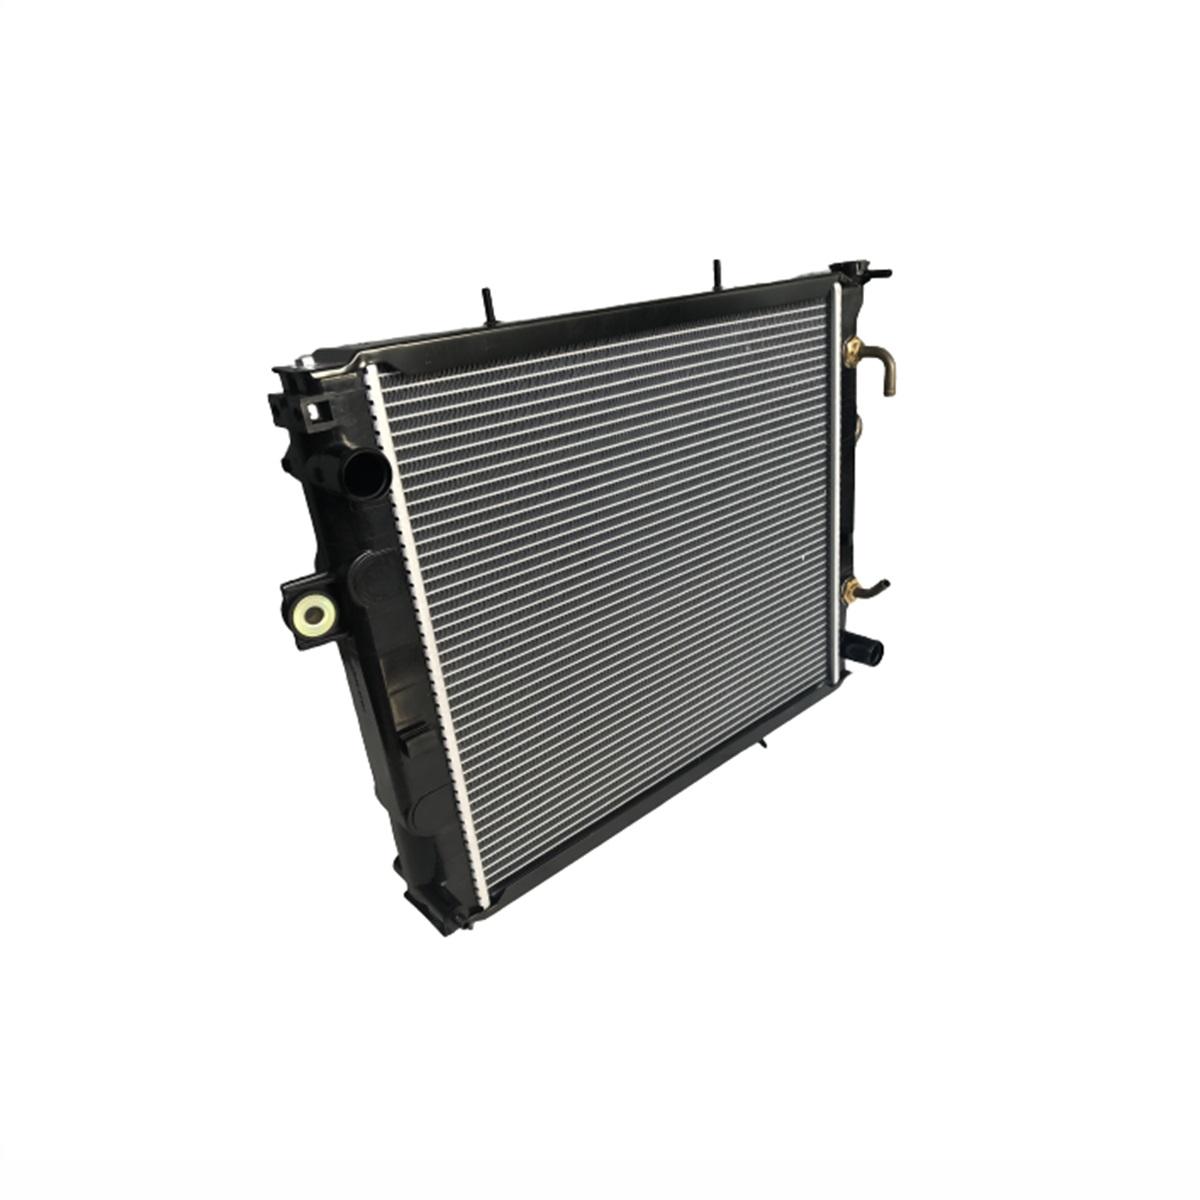 Radiador Empilhadeira Hyster / Nissan / Yale 500x448x48